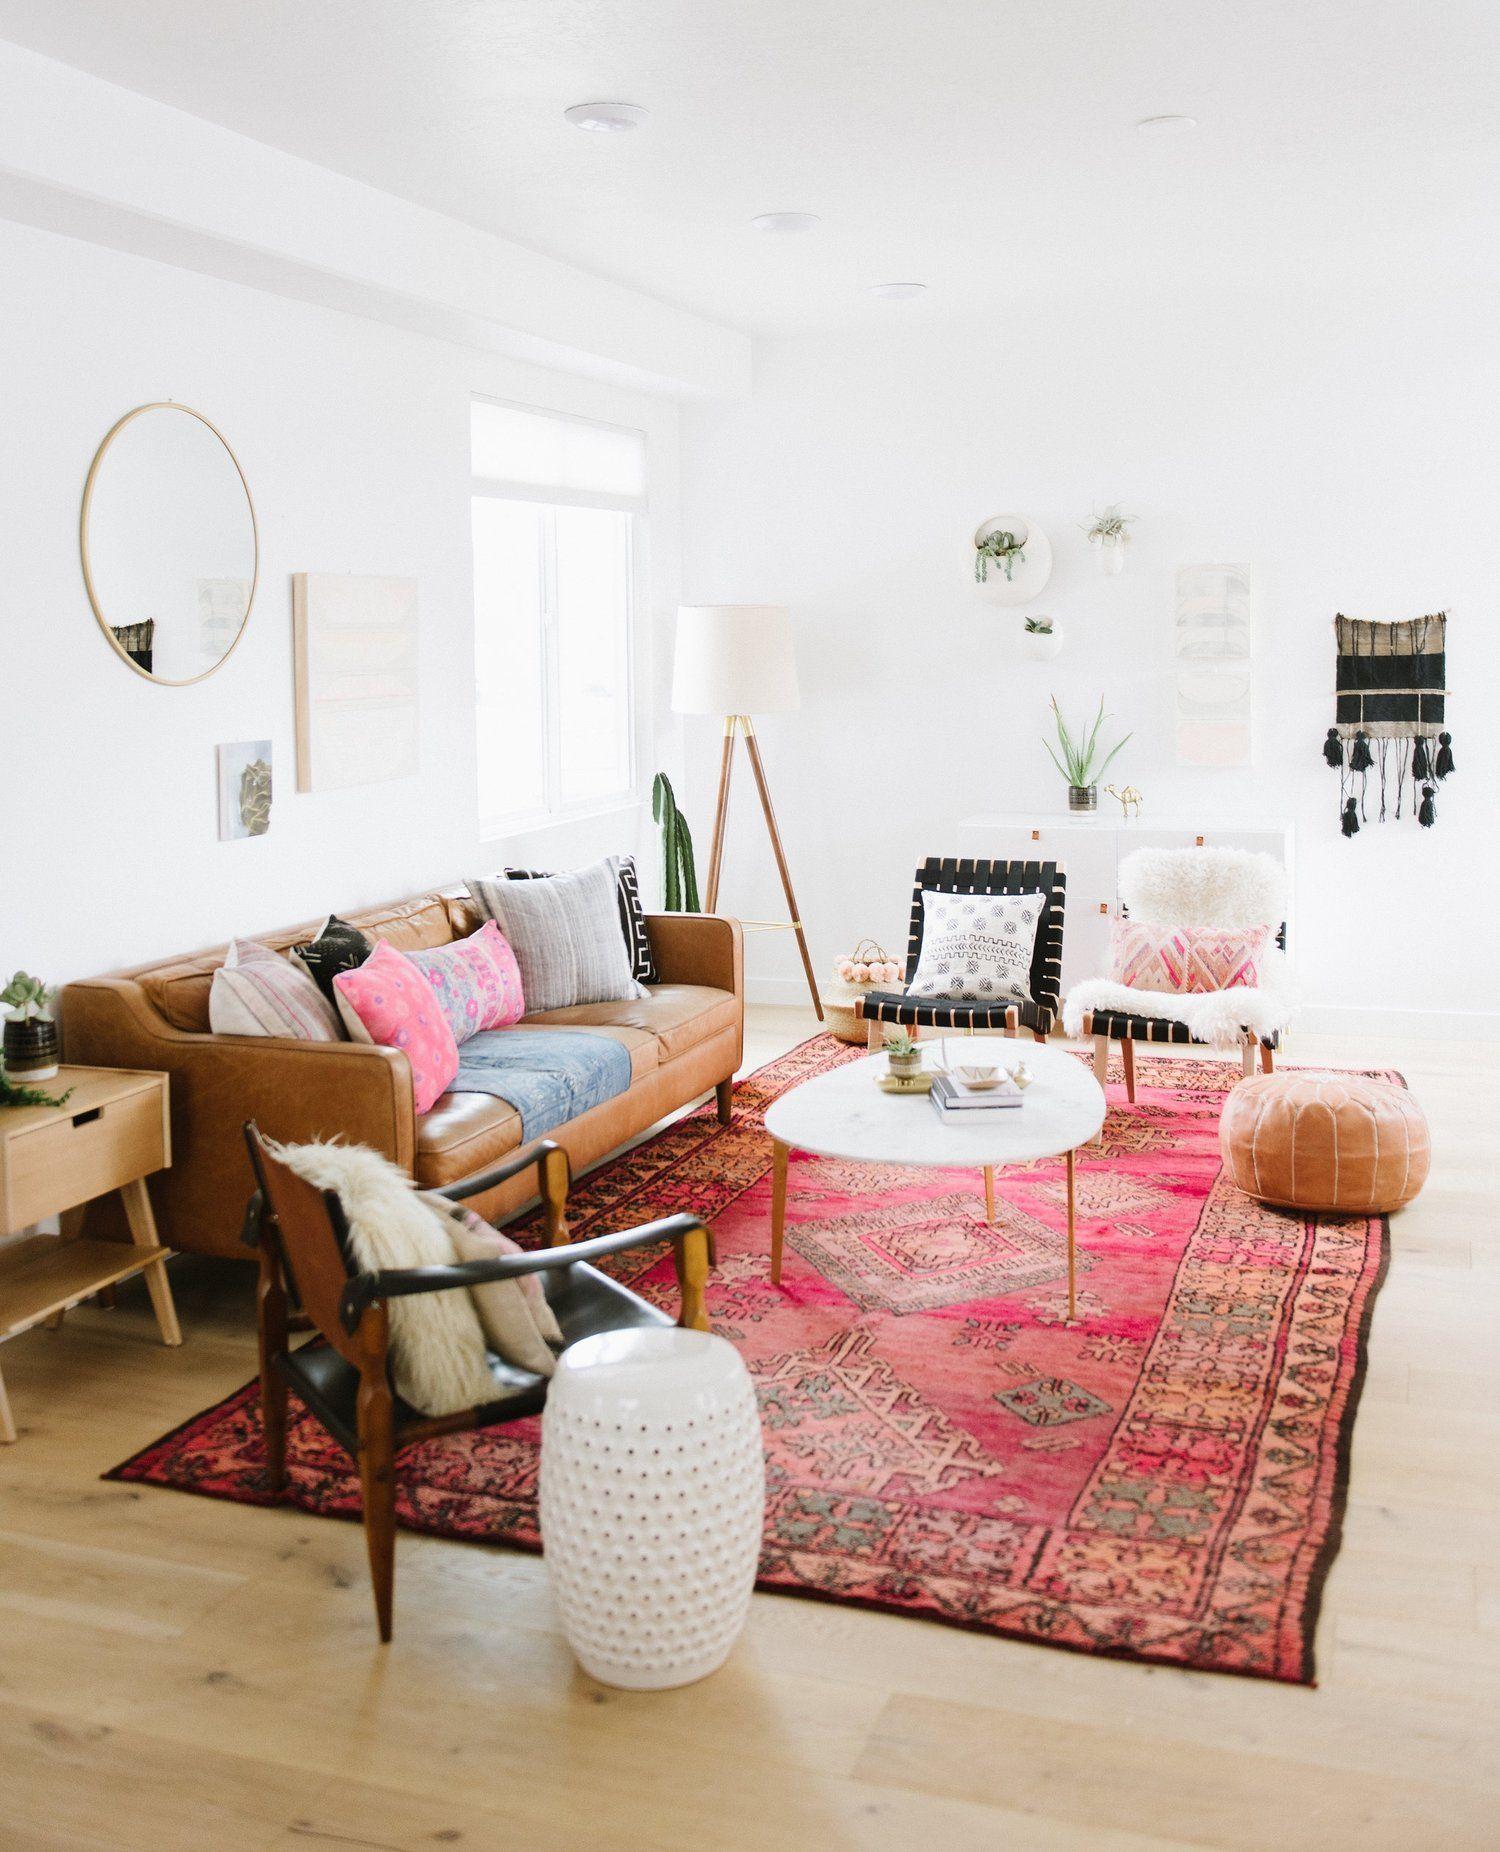 shops we love} Loom + Kiln | Pinterest | Tan leather sofas, Oriental ...